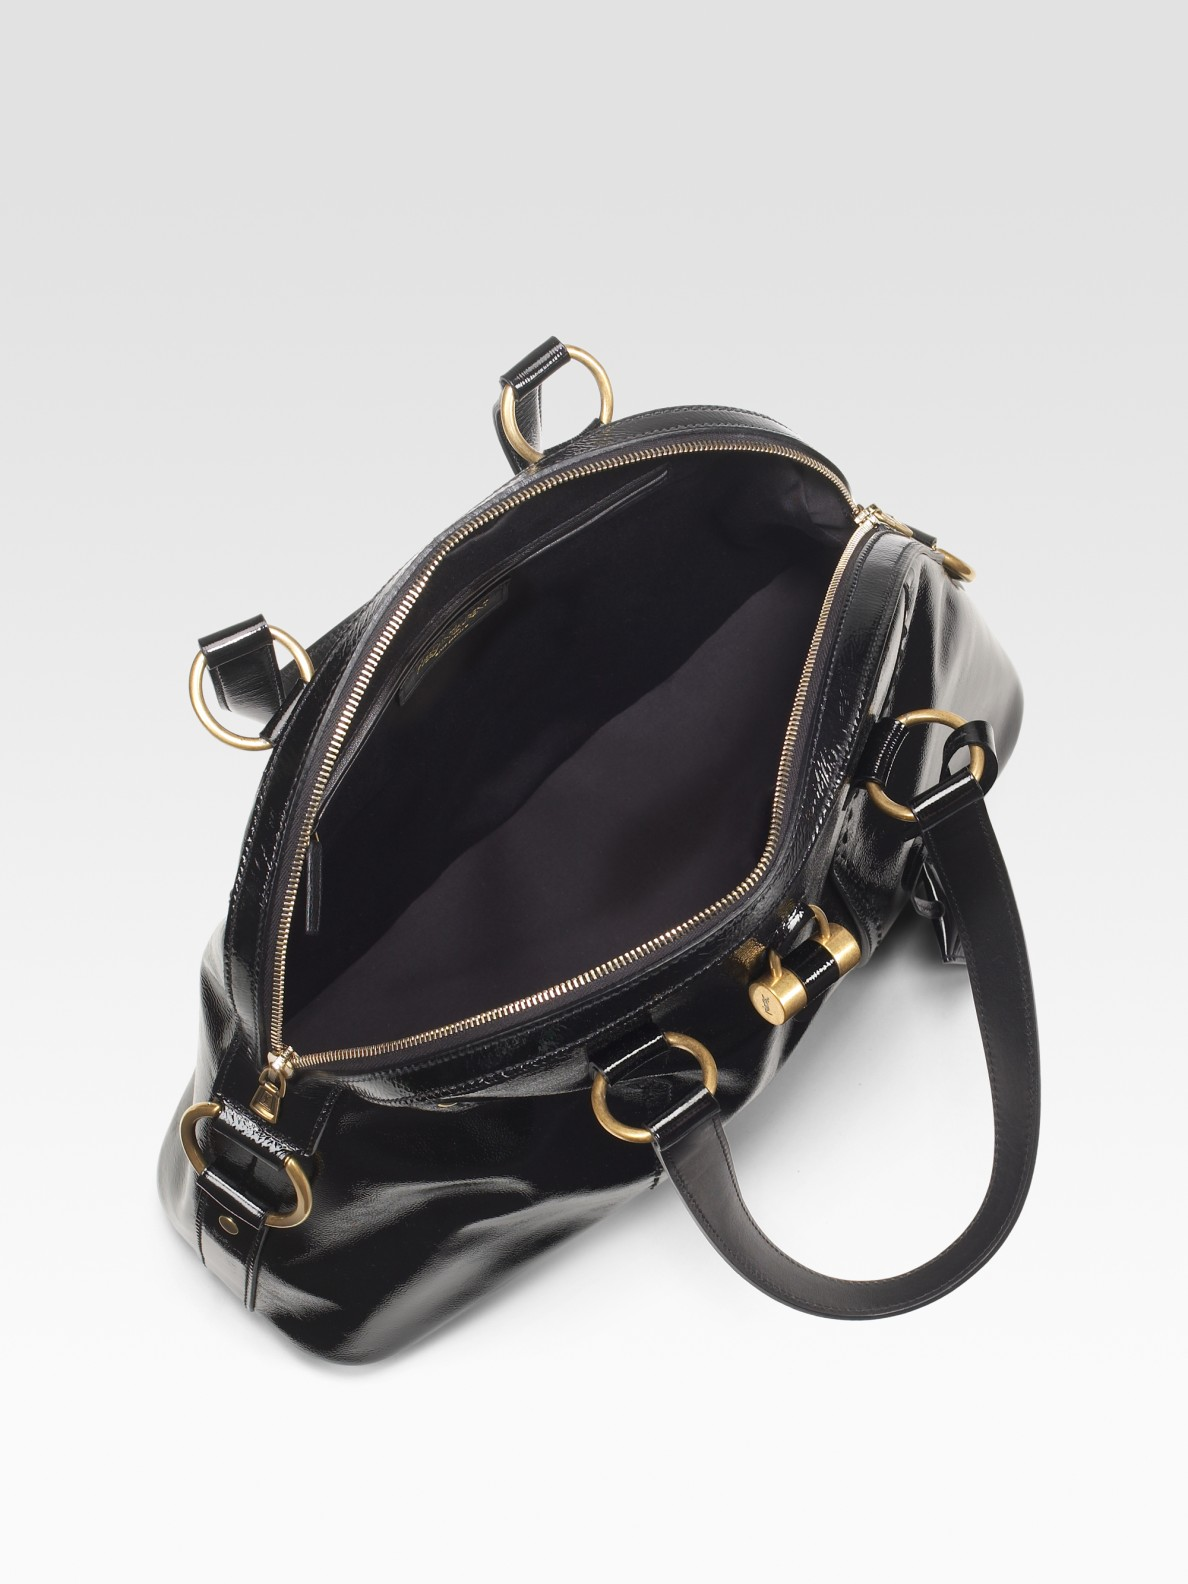 buy yves saint laurent bag - Saint laurent Patent Leather Muse Bag in Black | Lyst